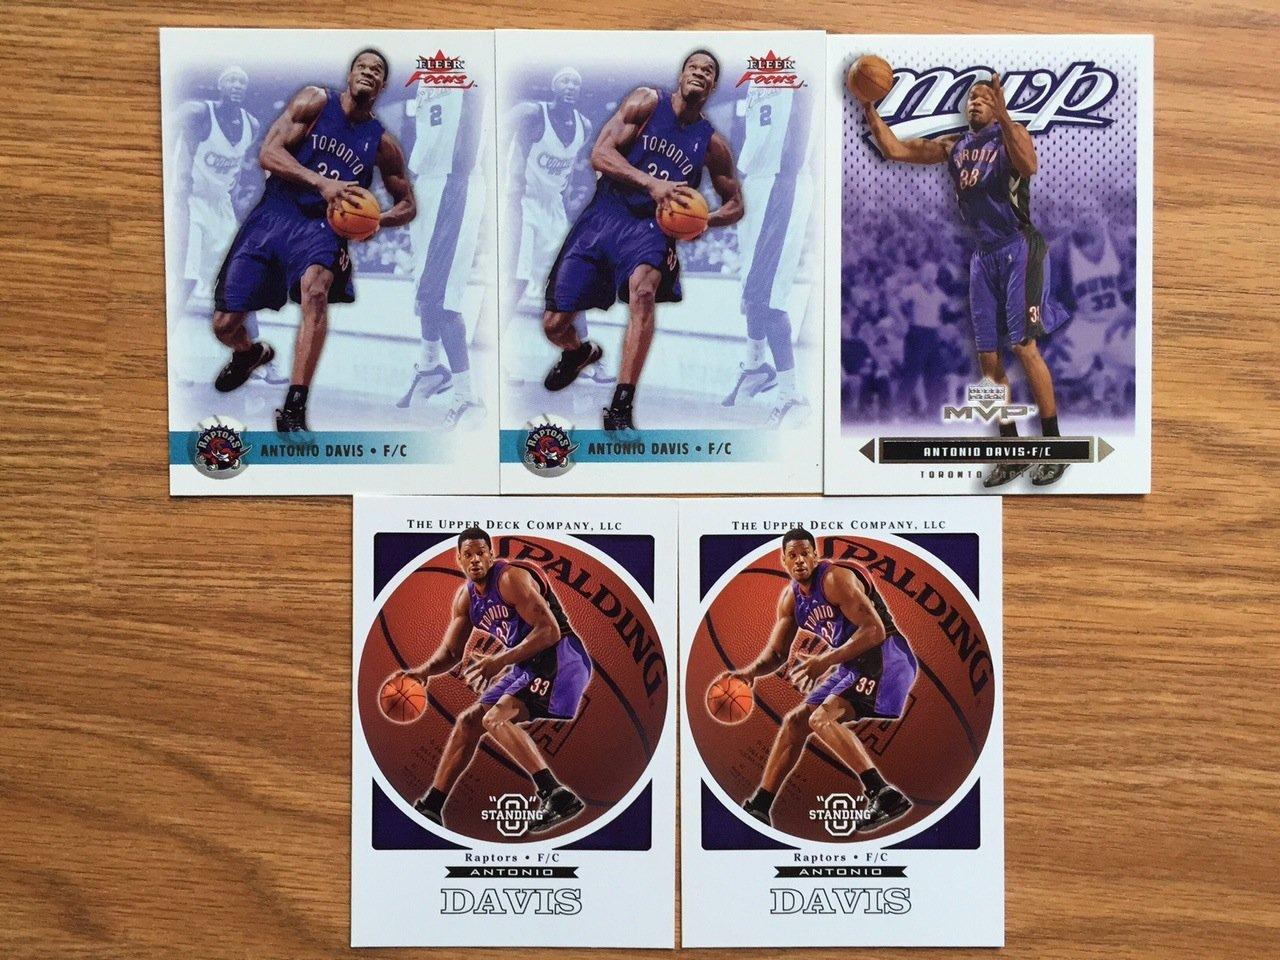 Toronto raptors Antonio Davis basketball cards lot - $4 Free Shipping